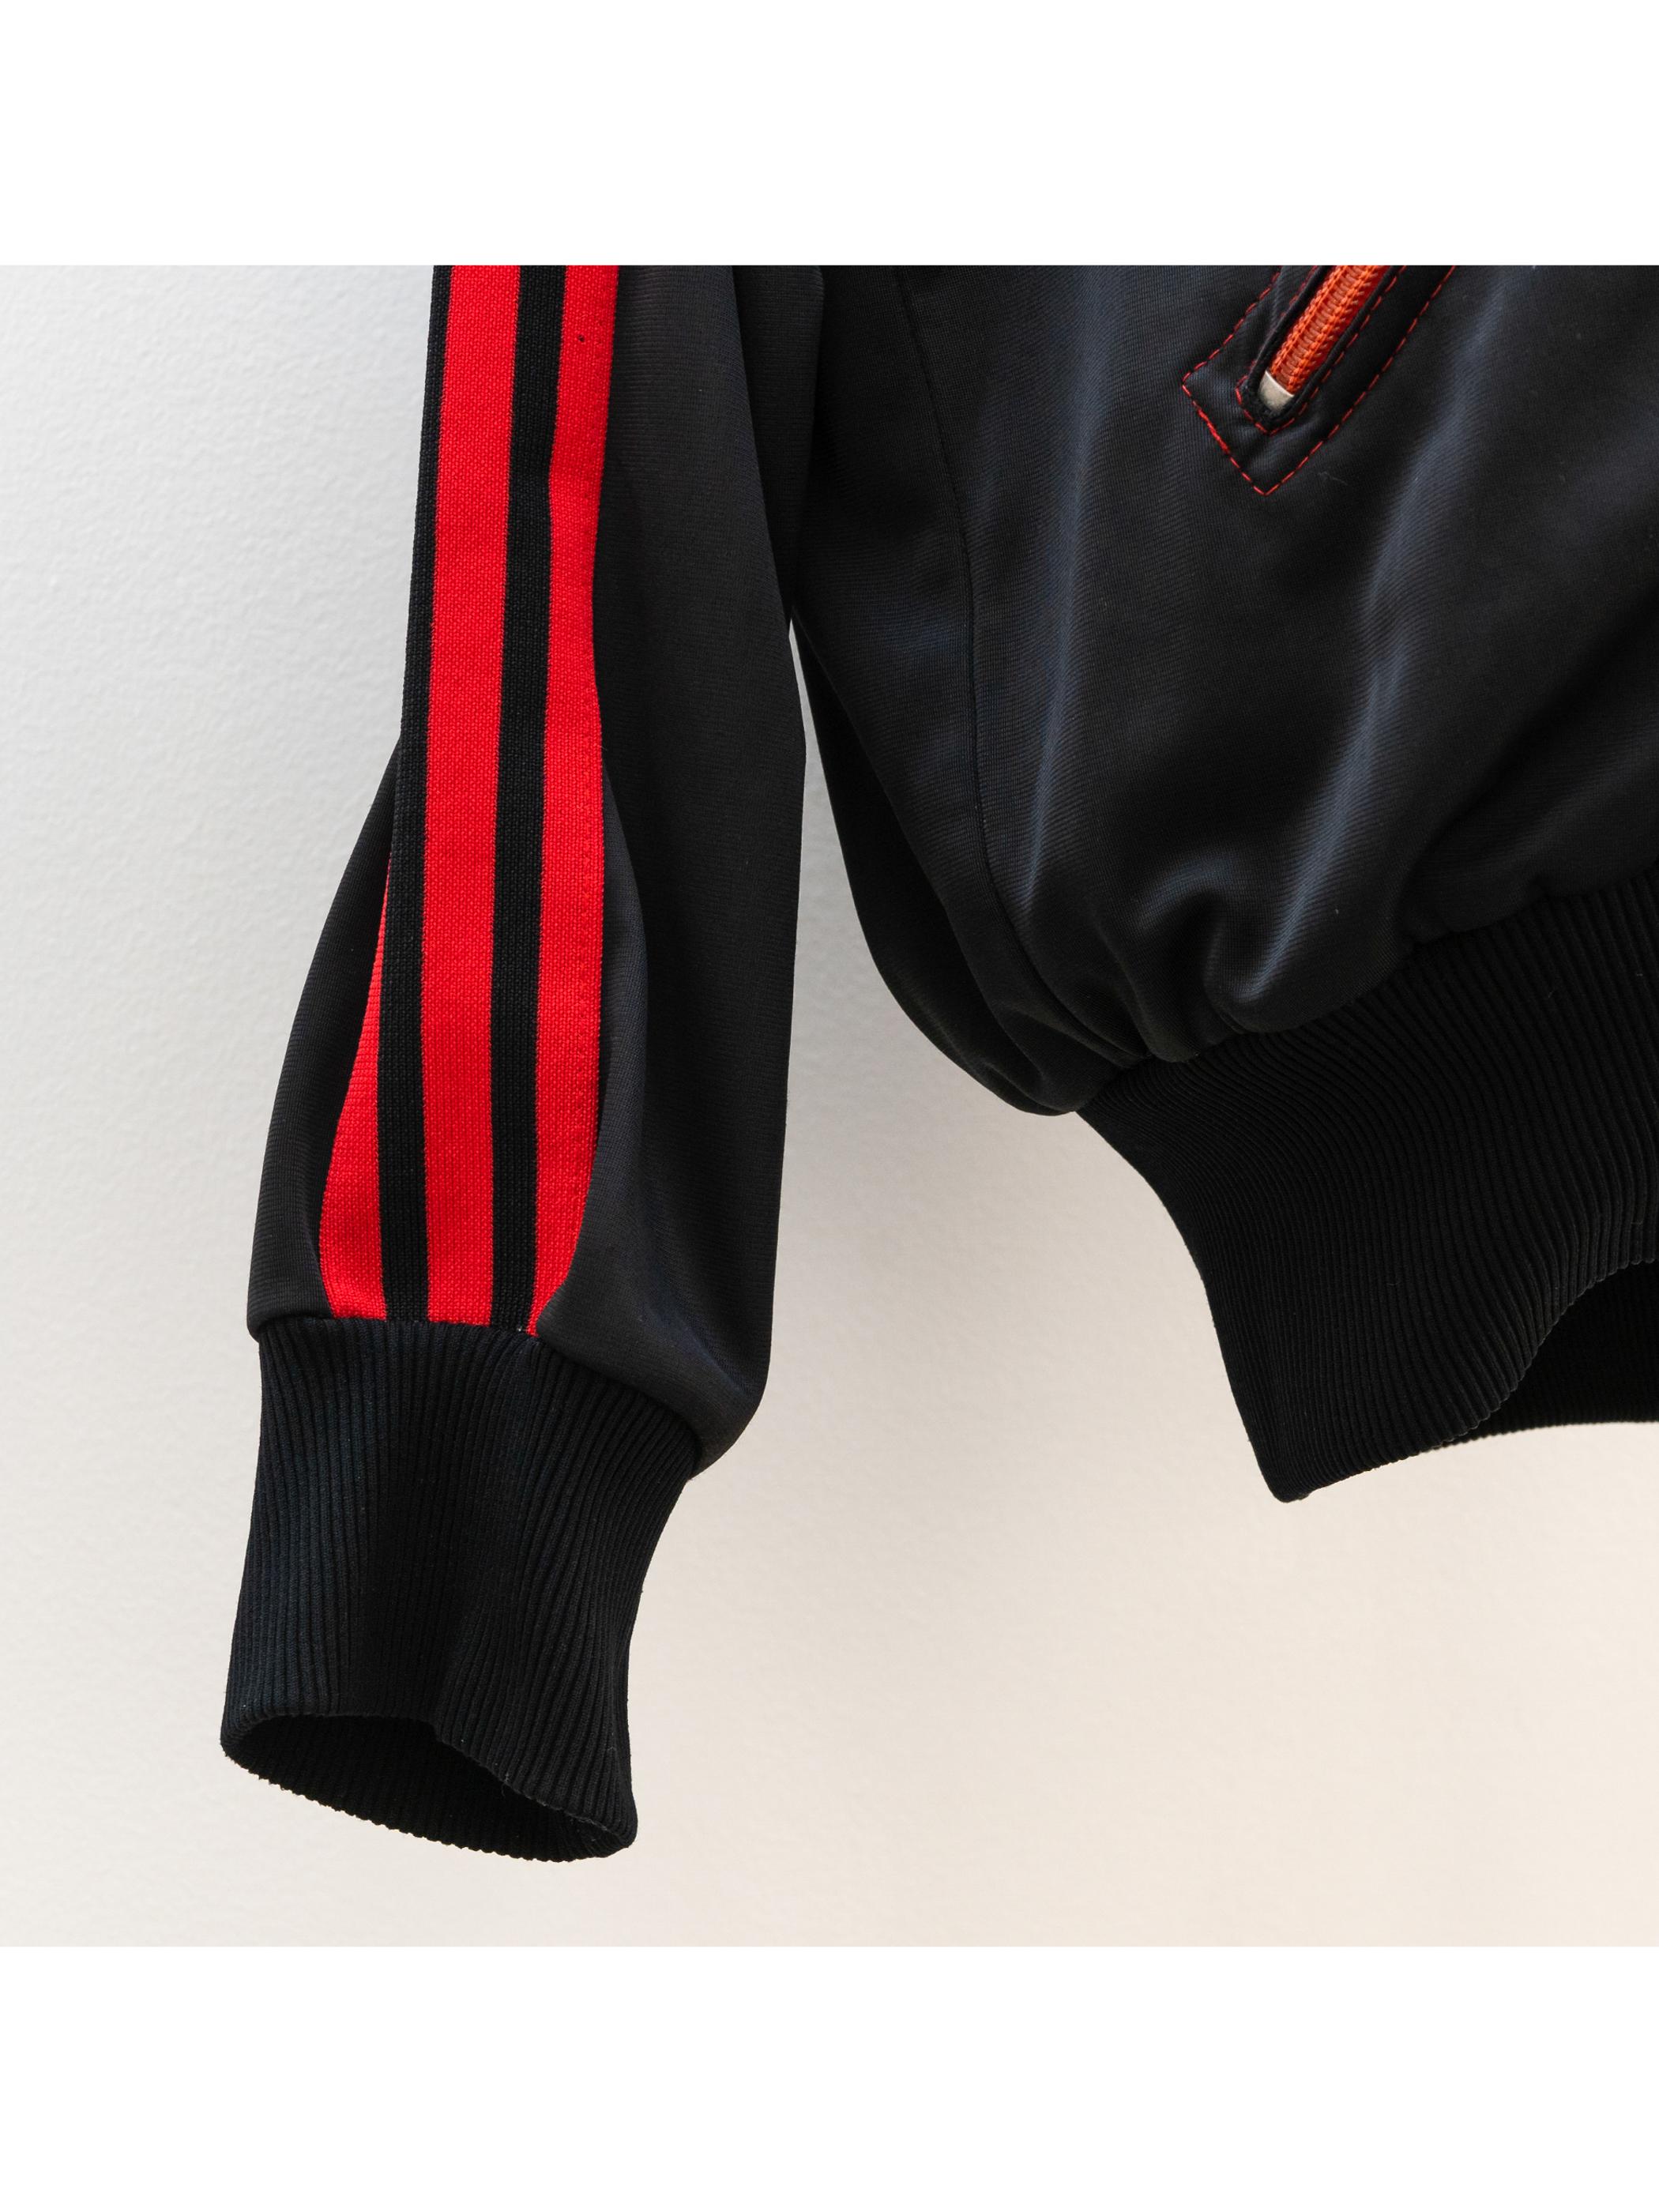 70's~80's adidas